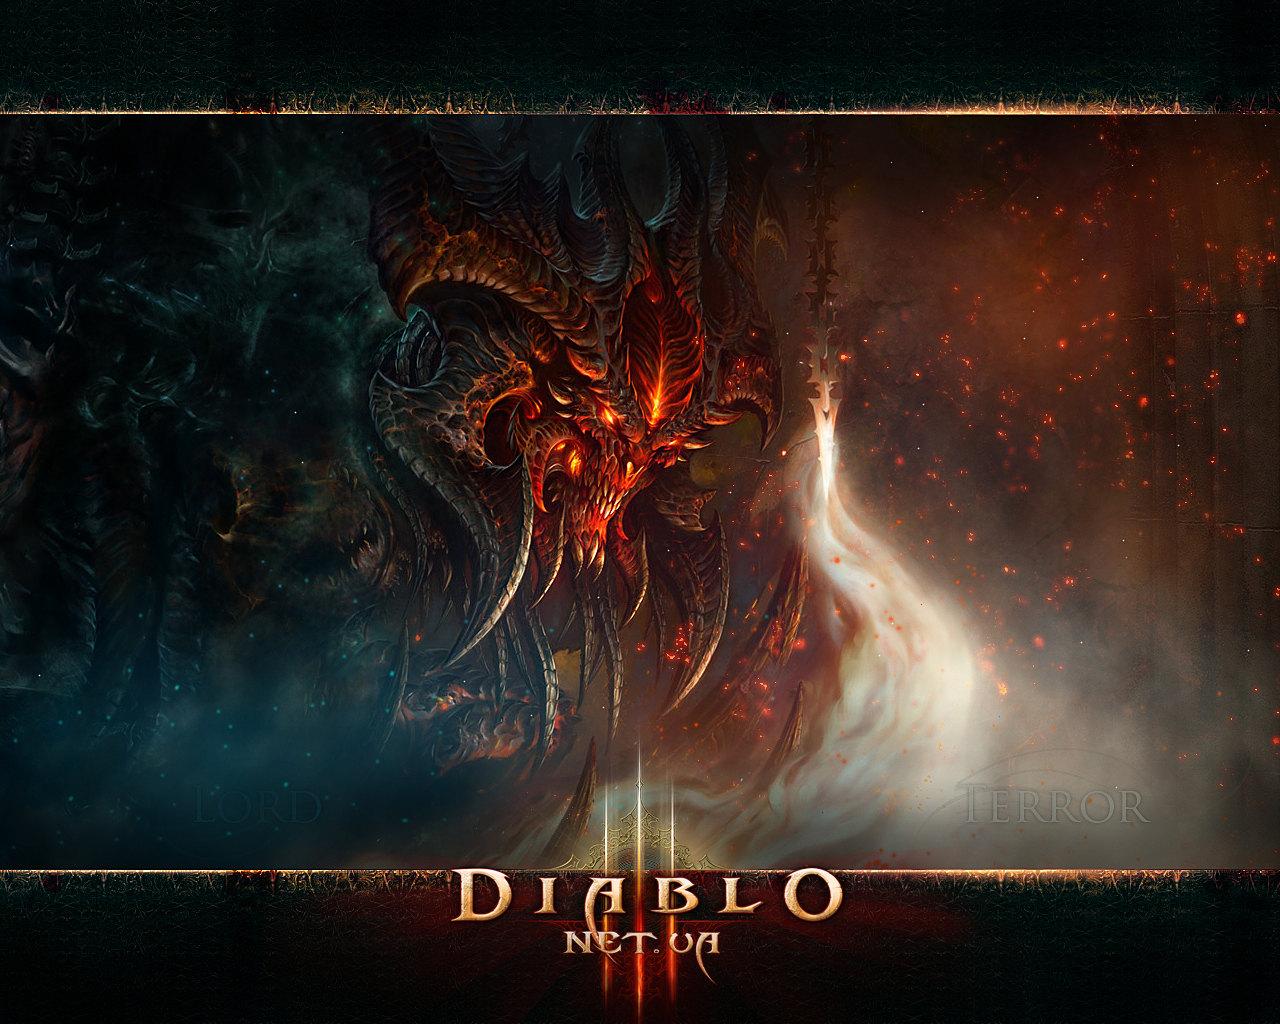 Release May 15th, 2012 news - The Diablo III Fanbase - Mod DB